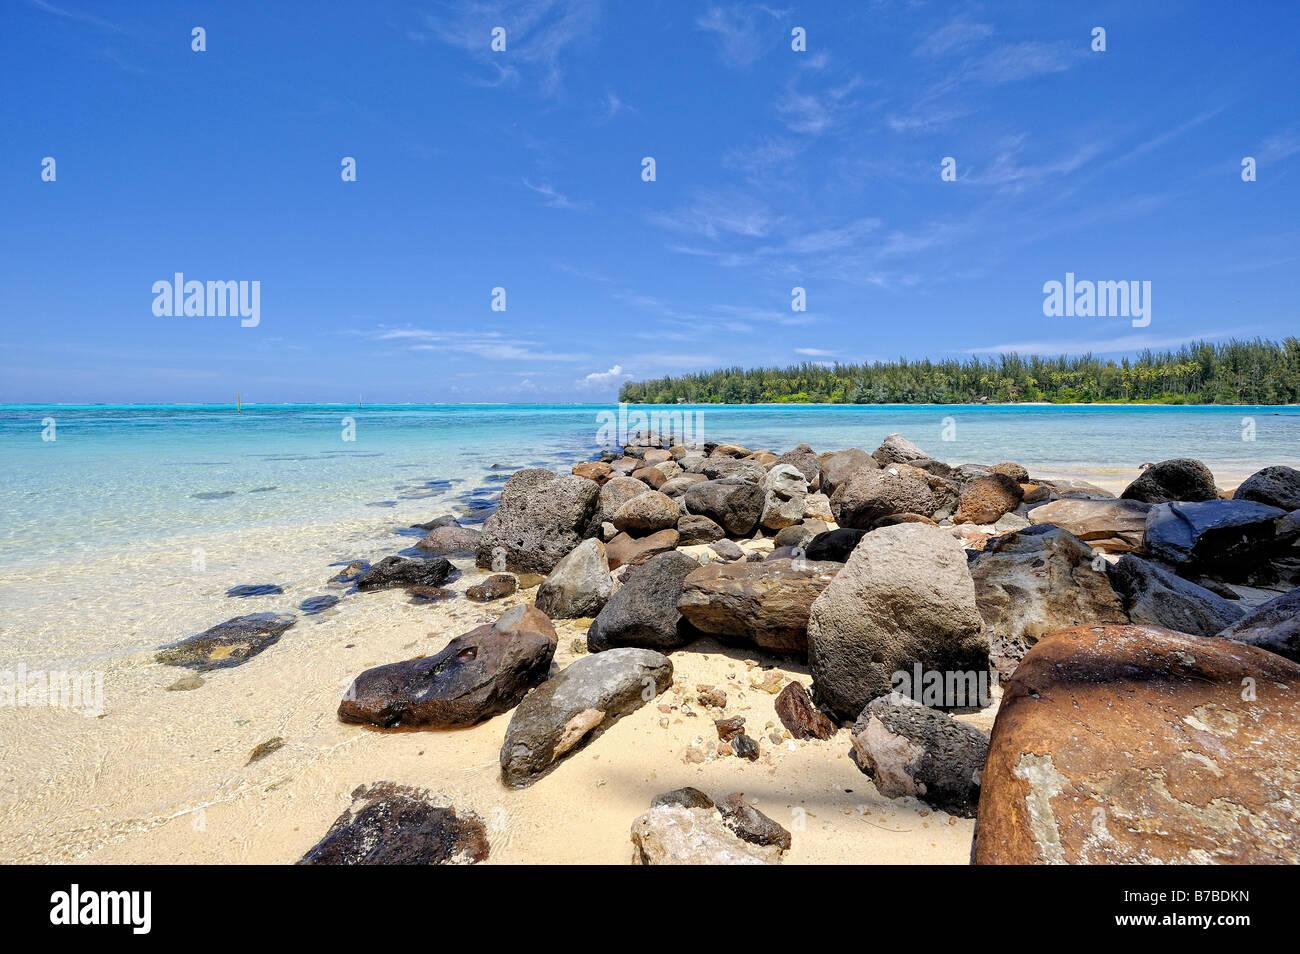 Stony pier on a beach of Papetoia, Moorea, French Polynesia - Stock Image